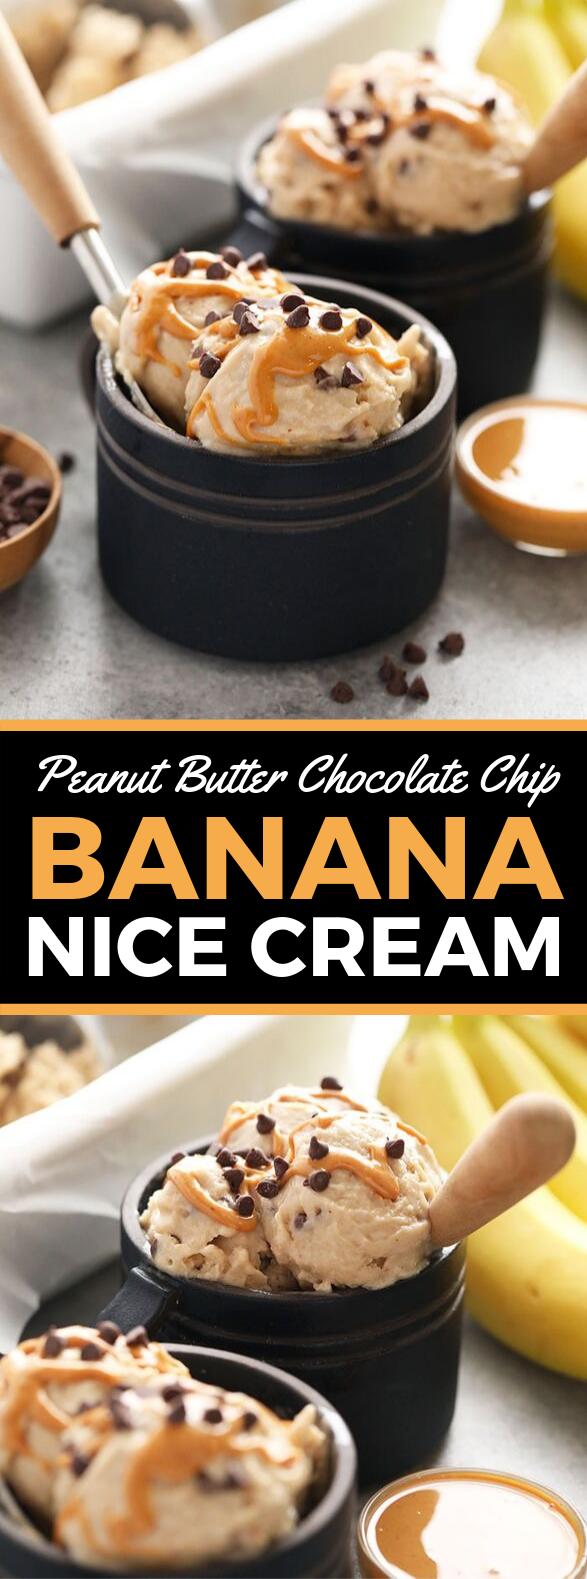 PEANUT BUTTER BANANA NICE CREAM #desserts #dairyfree